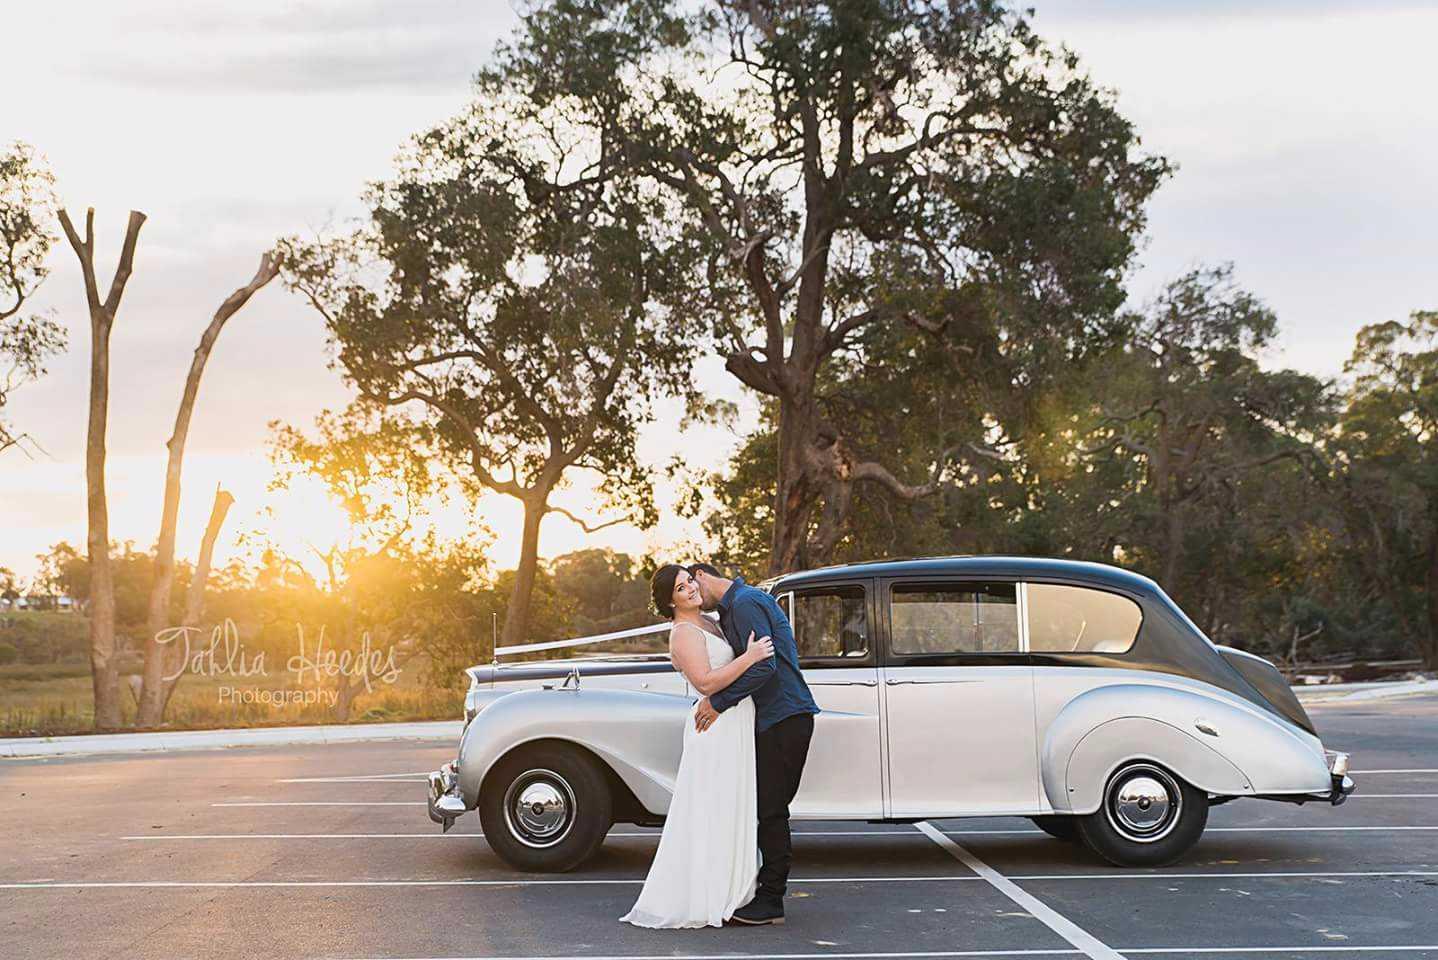 34-the-dip-very-nice-classics-wedding-cars-perth.jpg